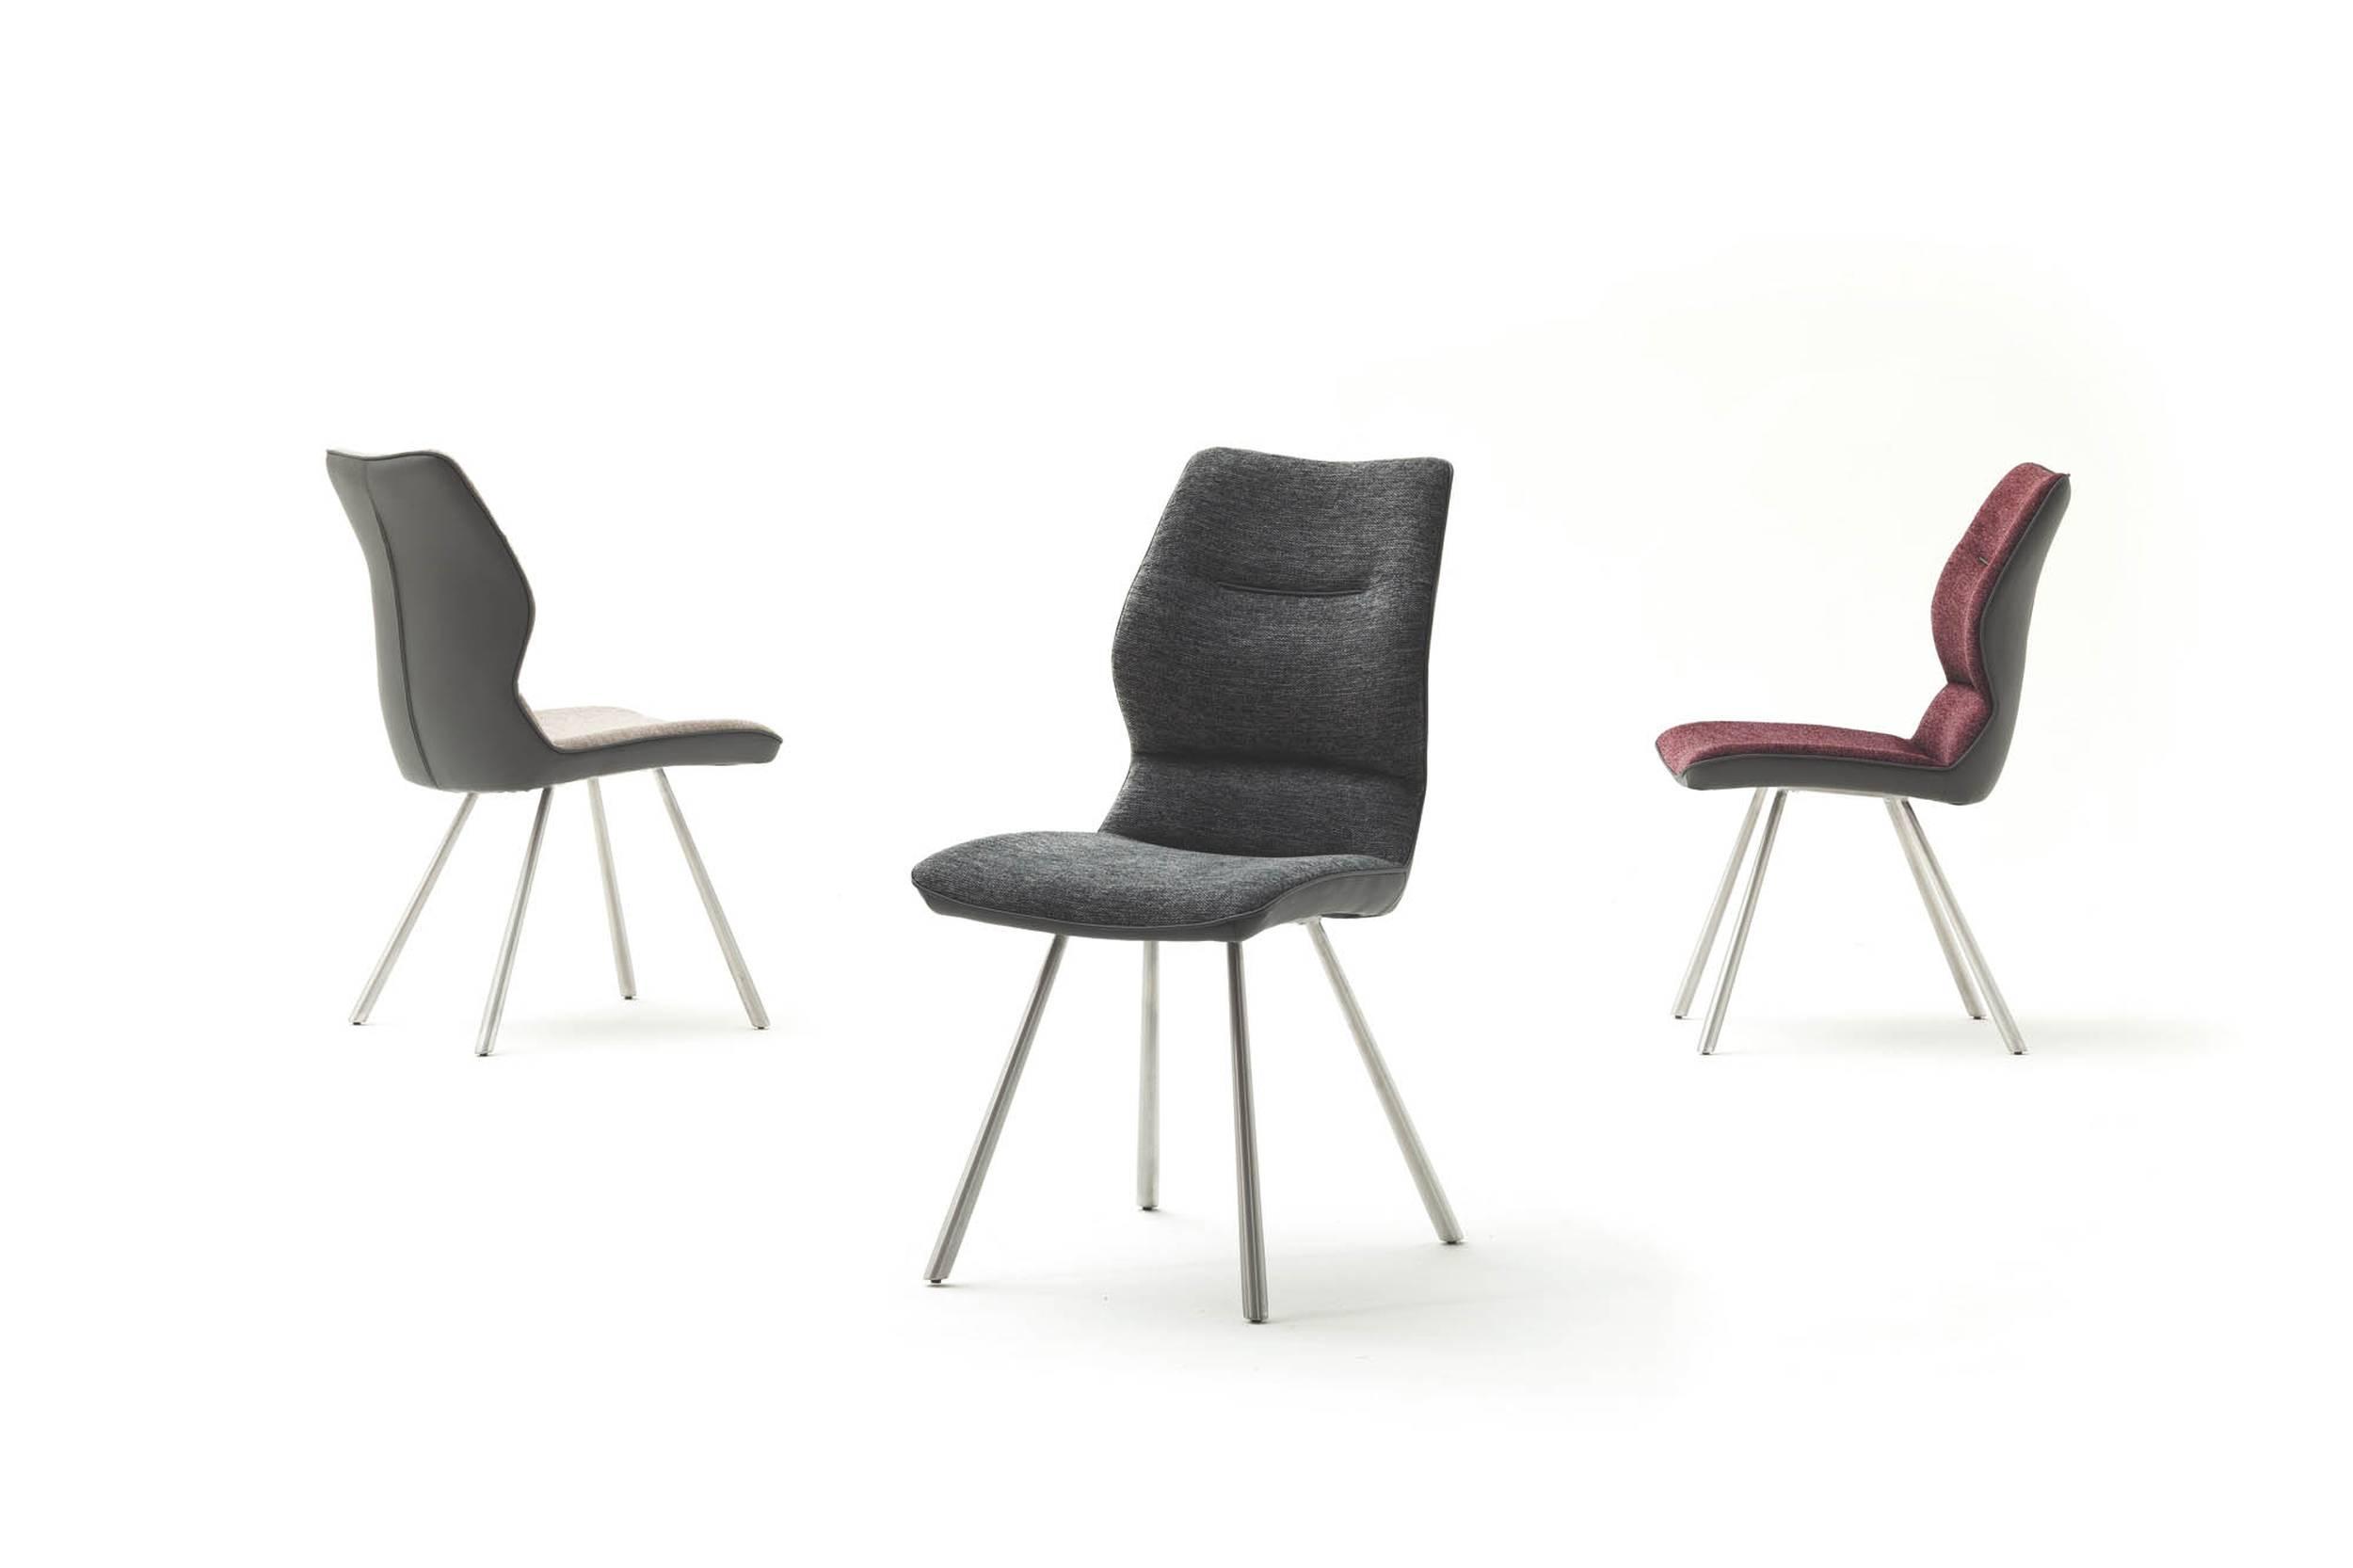 4-Fuß-Stuhl  OLAF